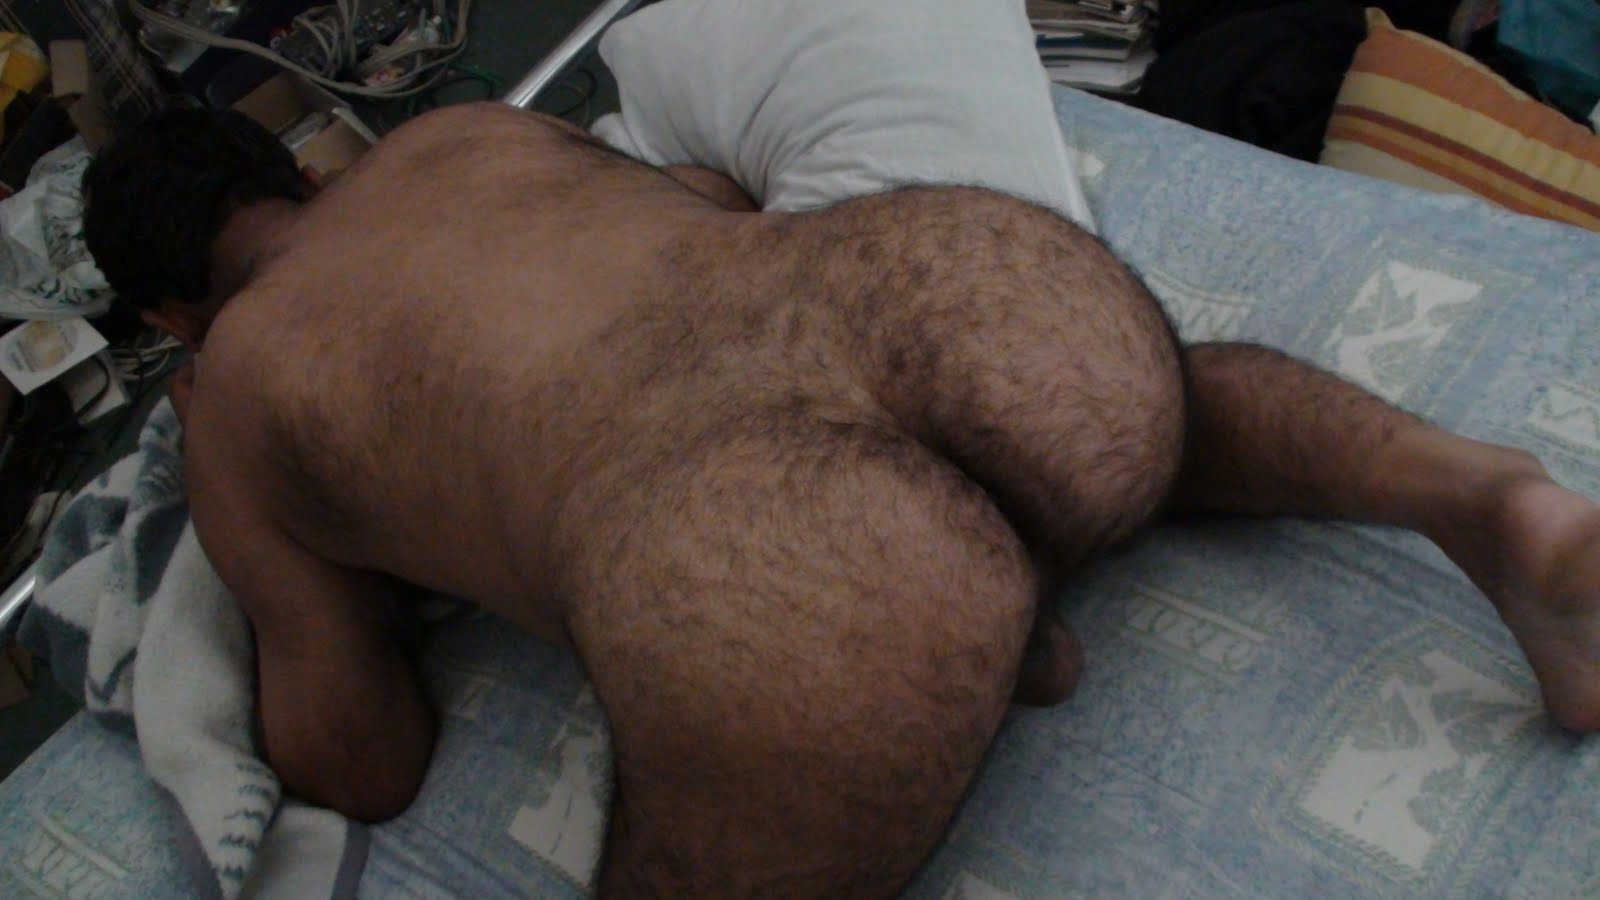 Men Ass Pictures 17